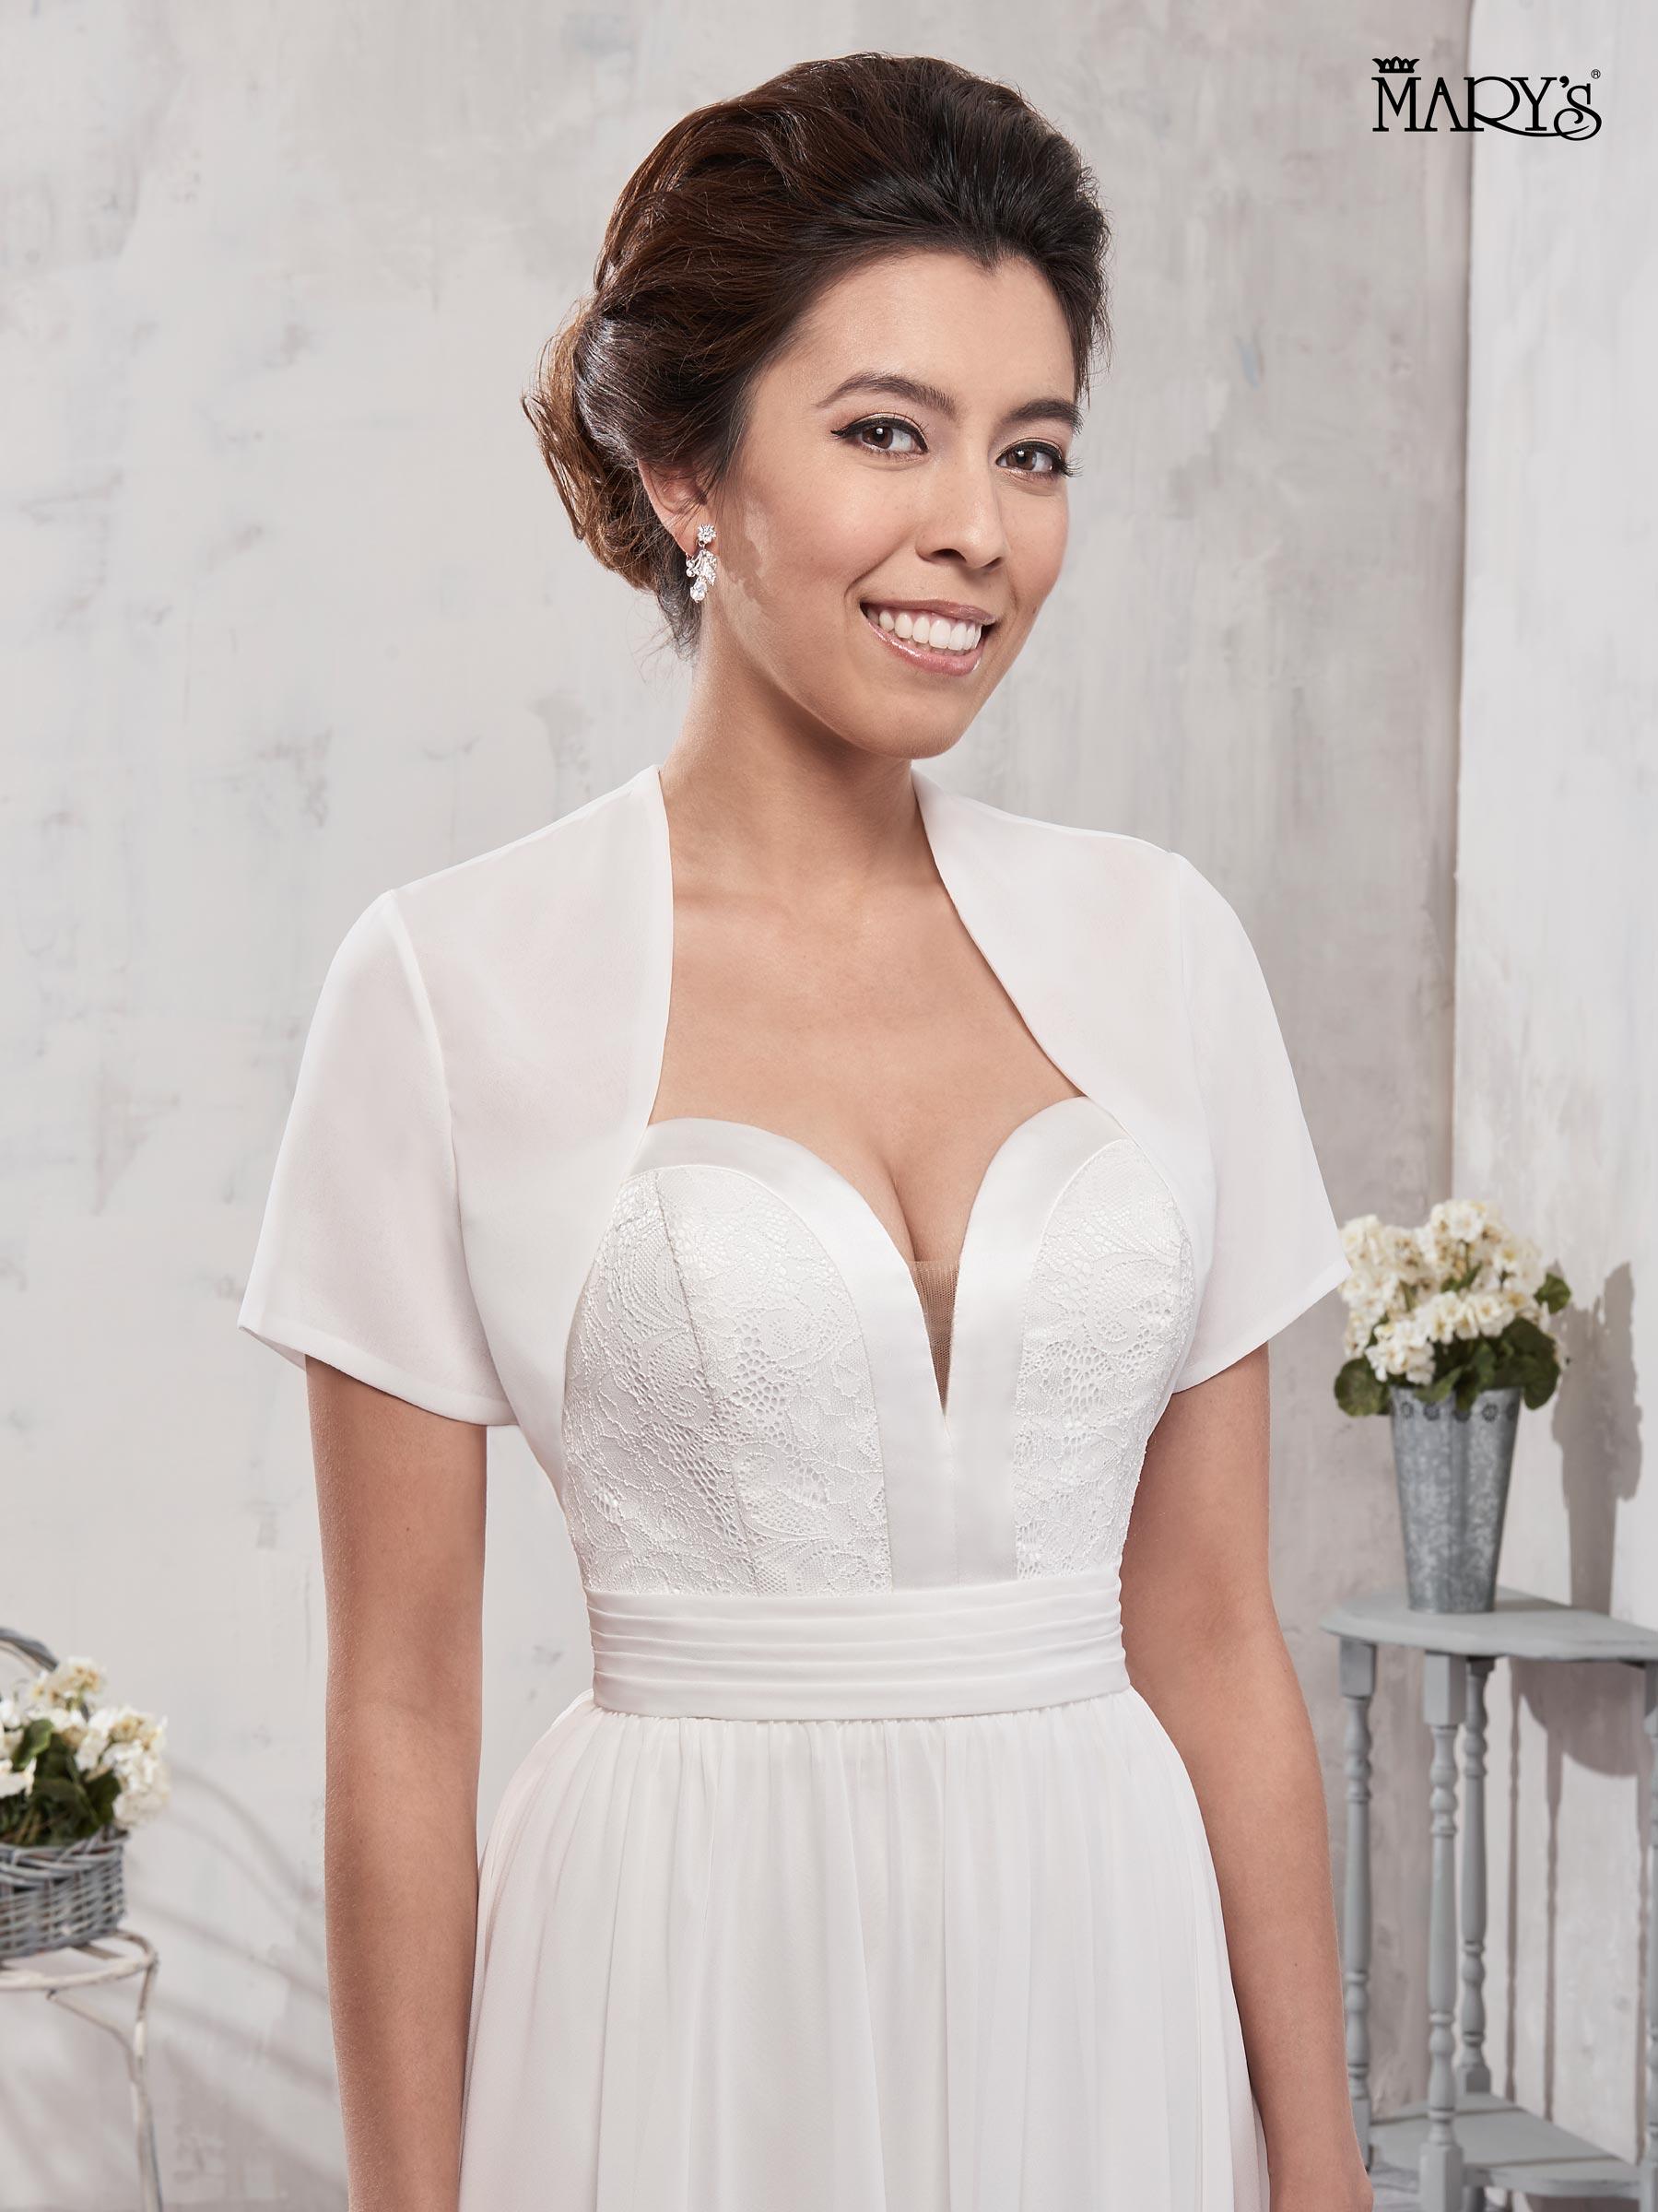 Bridal Wedding Dresses | Mary's | Style - MB1002